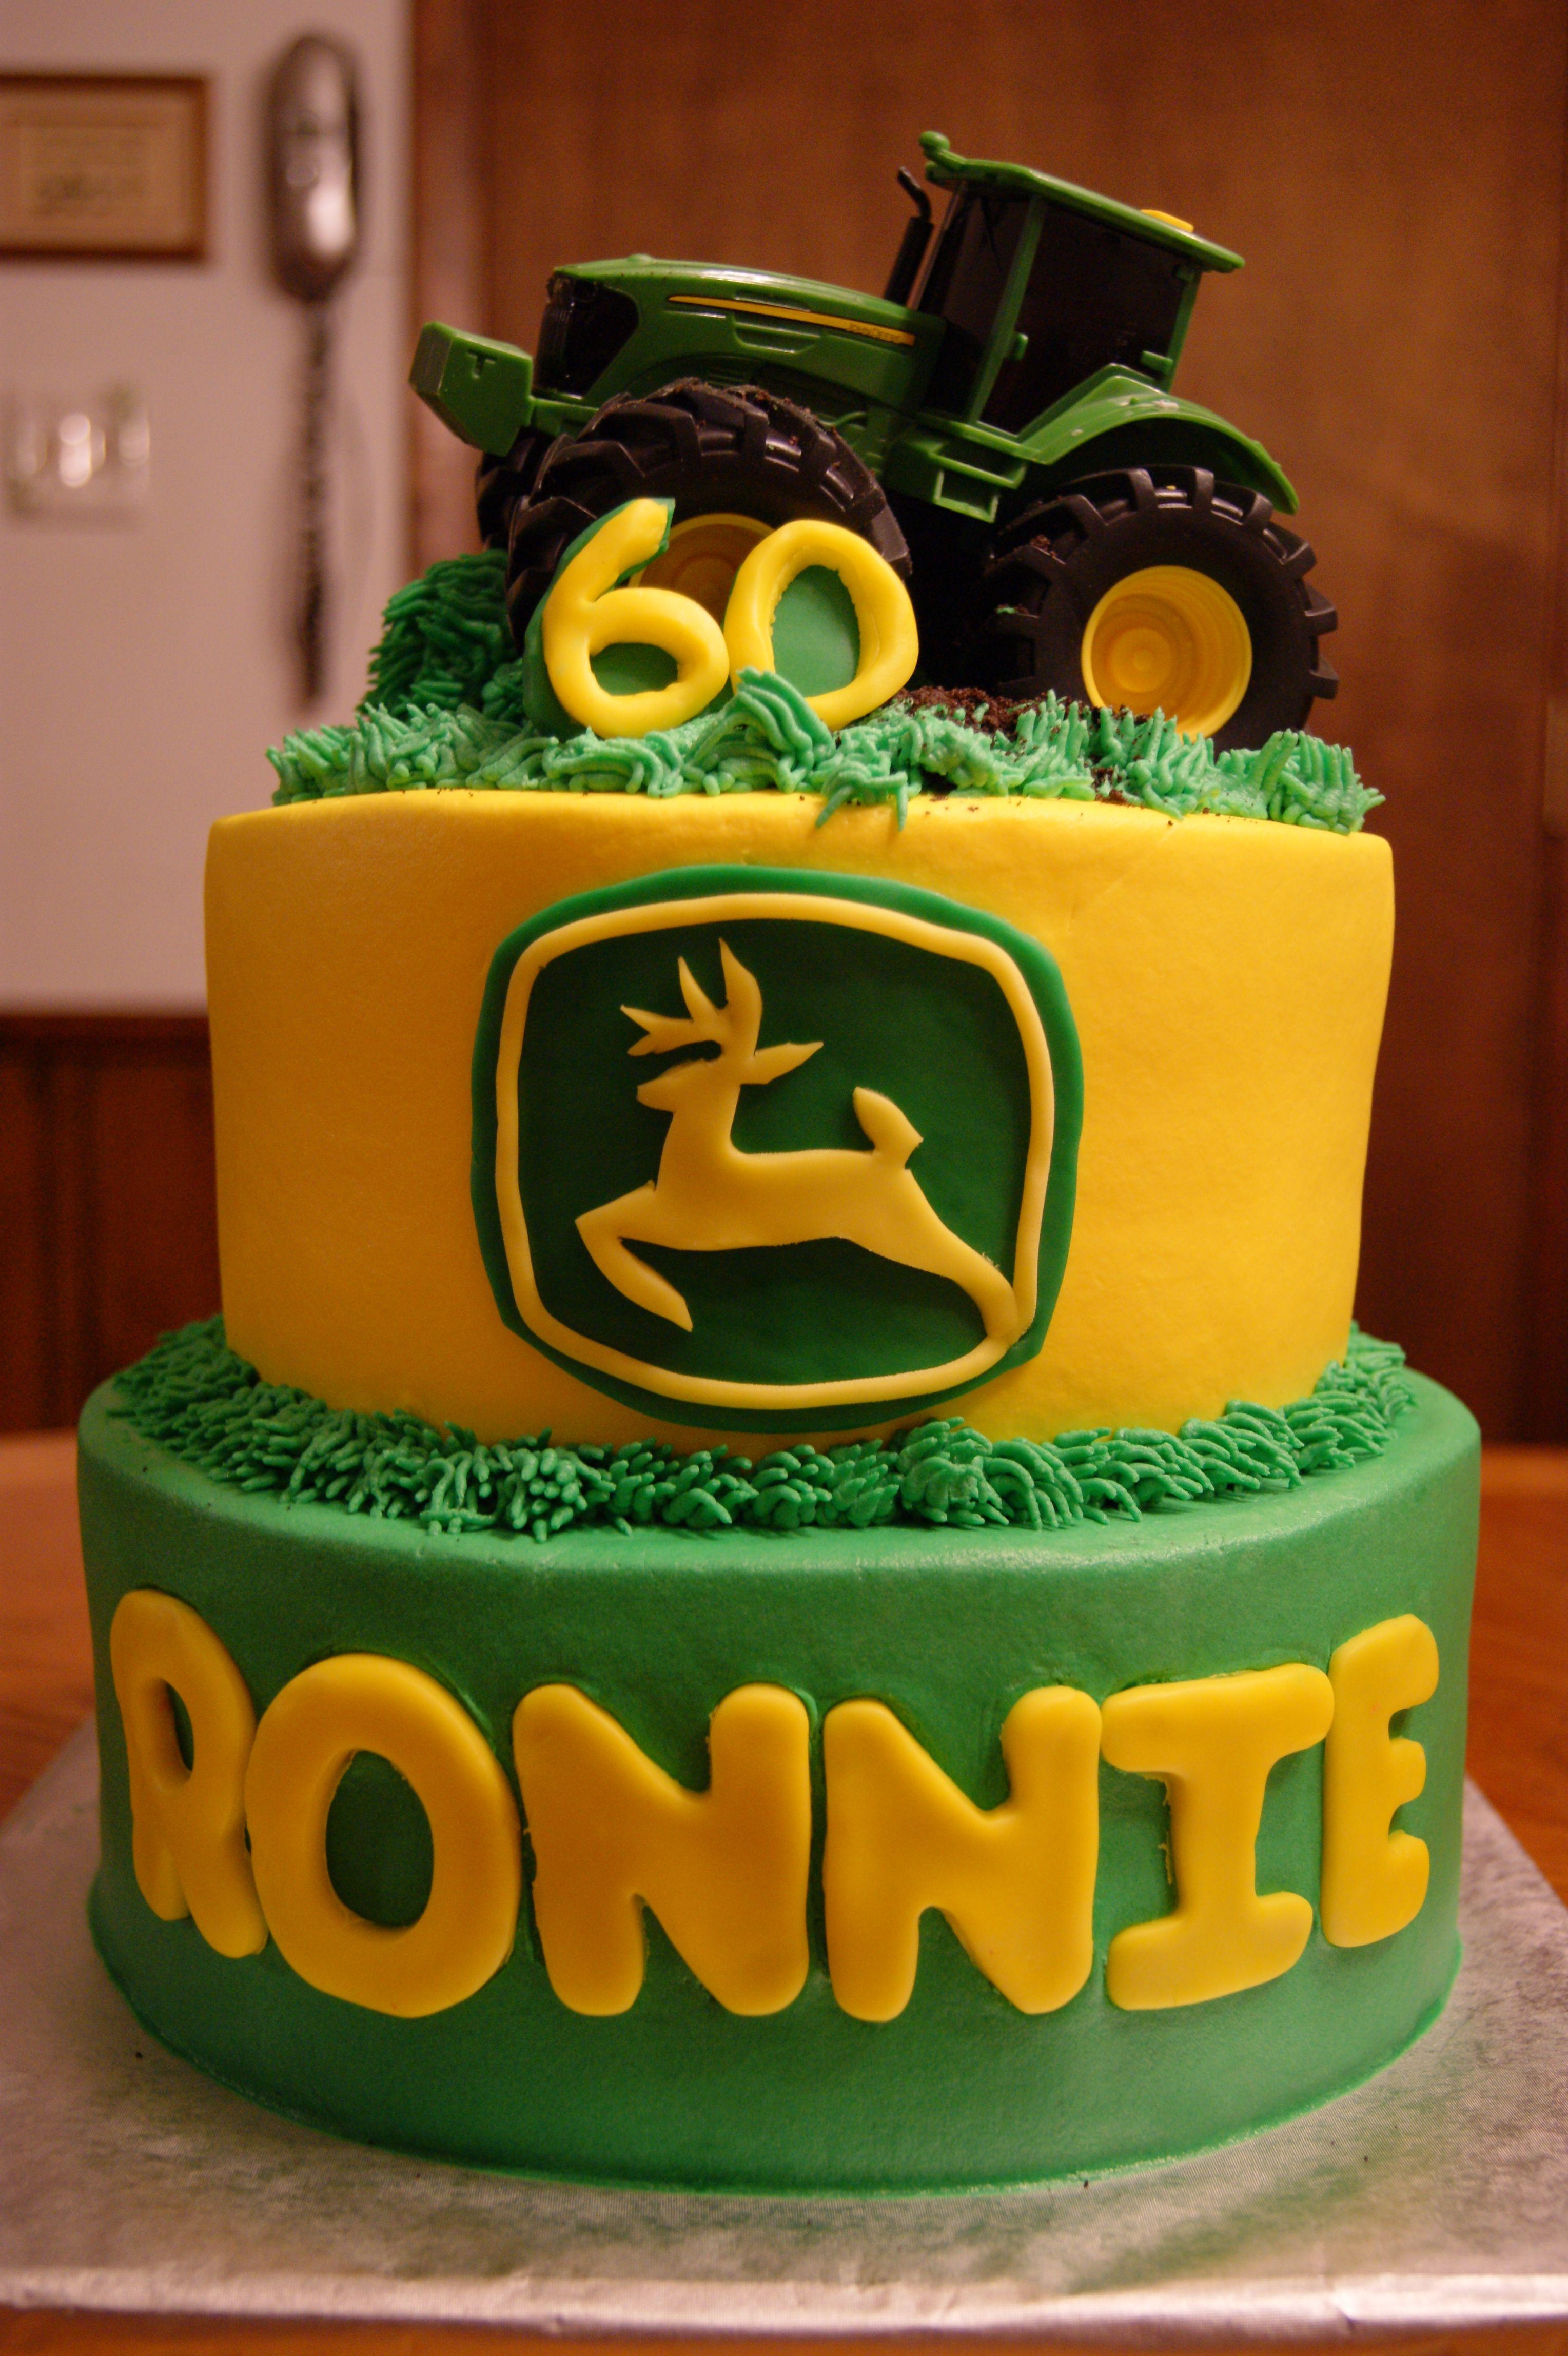 John Deere 60th Birthday Cake